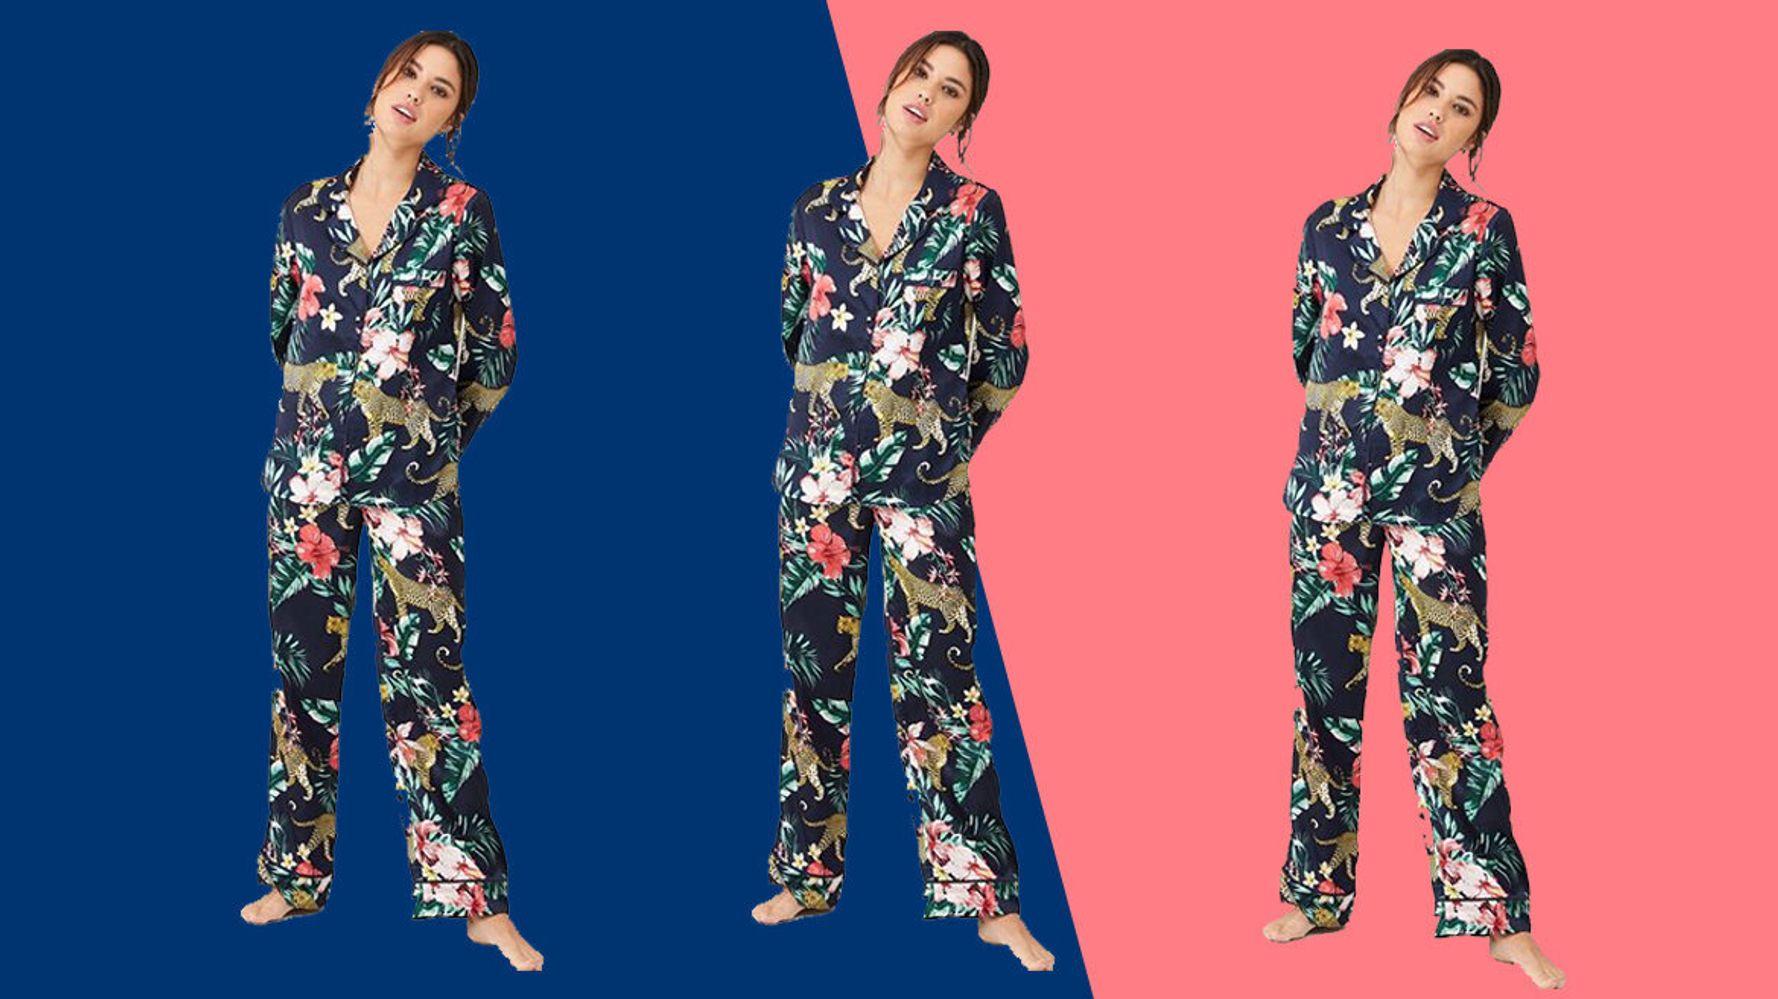 The 9 Best Festive Pyjamas For Women